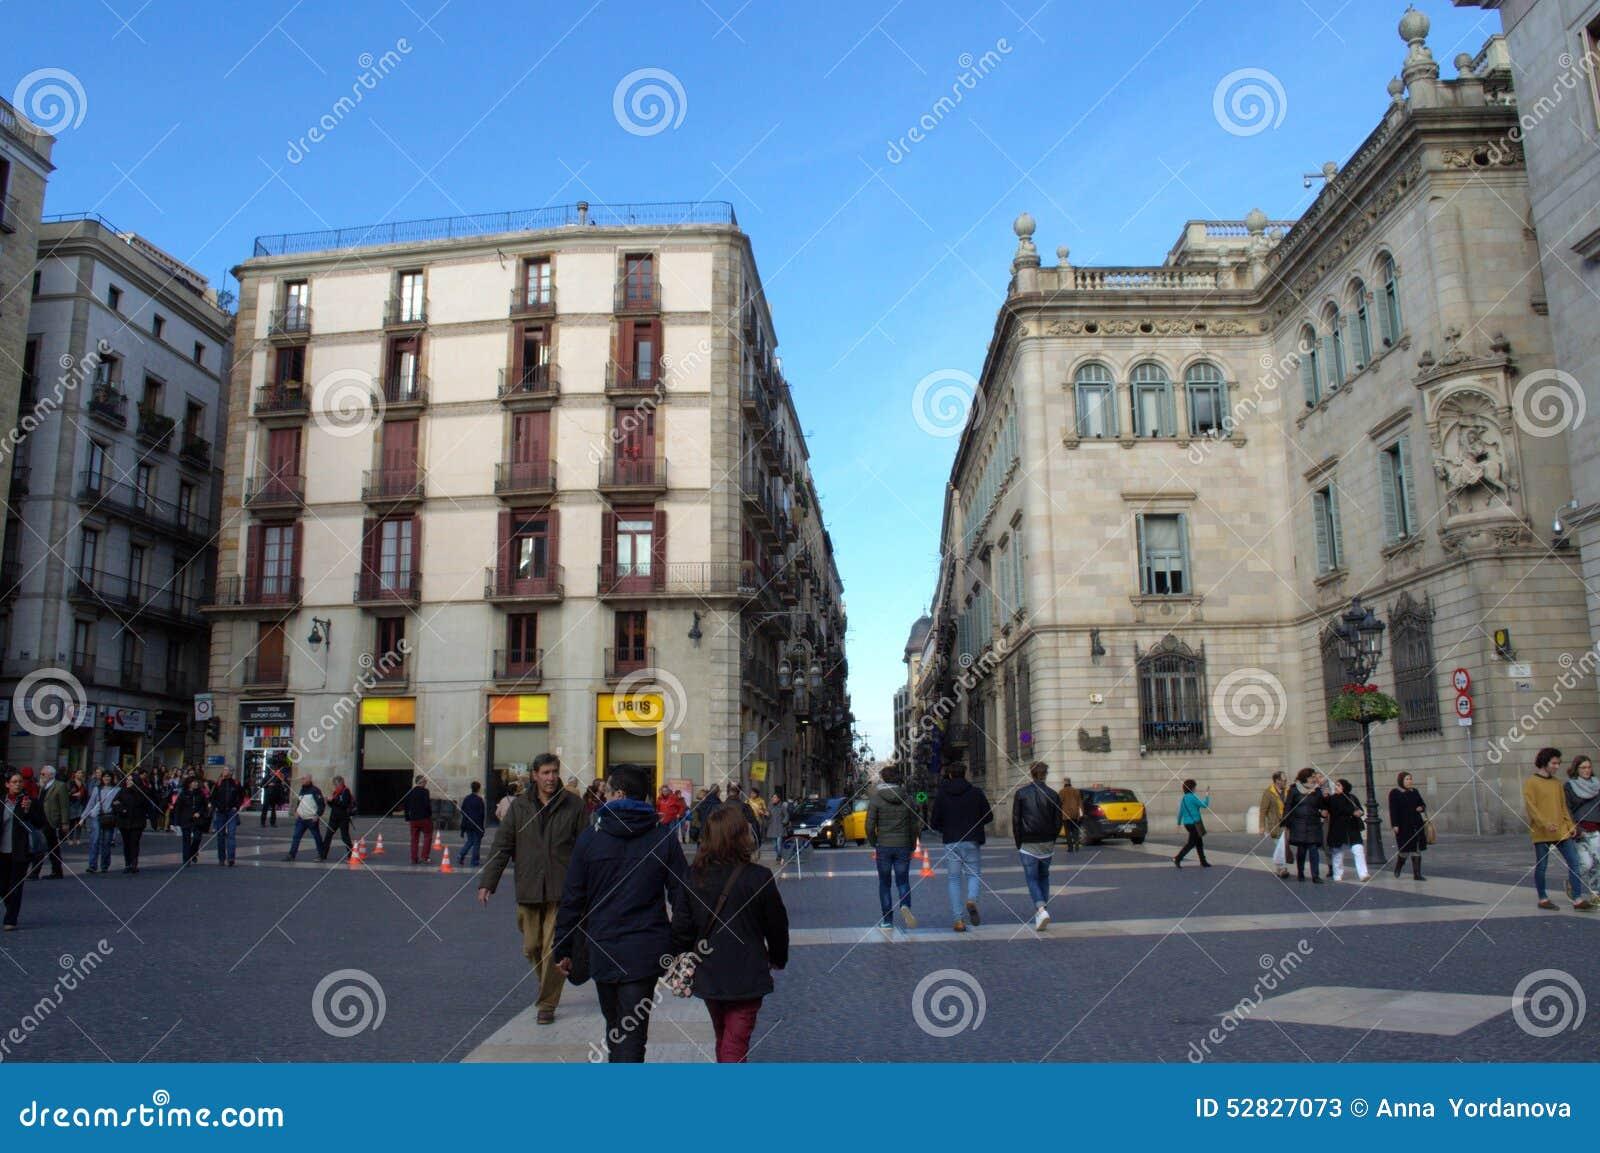 Barcelona Square Editorial Stock Photo  Image 52827073